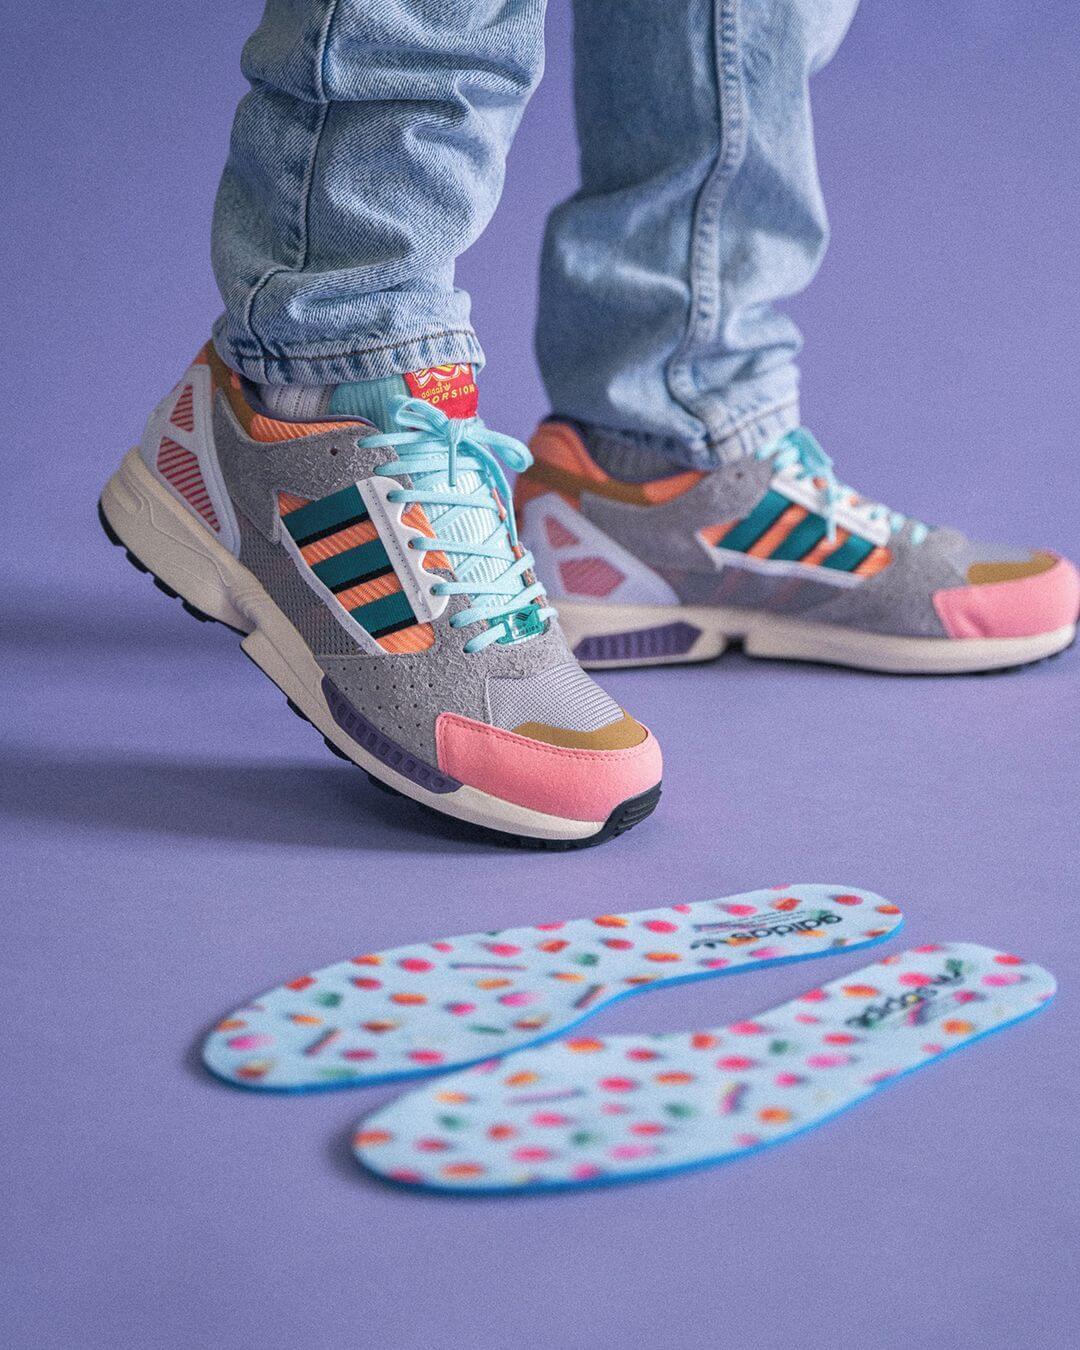 "on feet - adidas - ZX10/8 - ""Candyverse"" - GX1085 /ZX 10800"